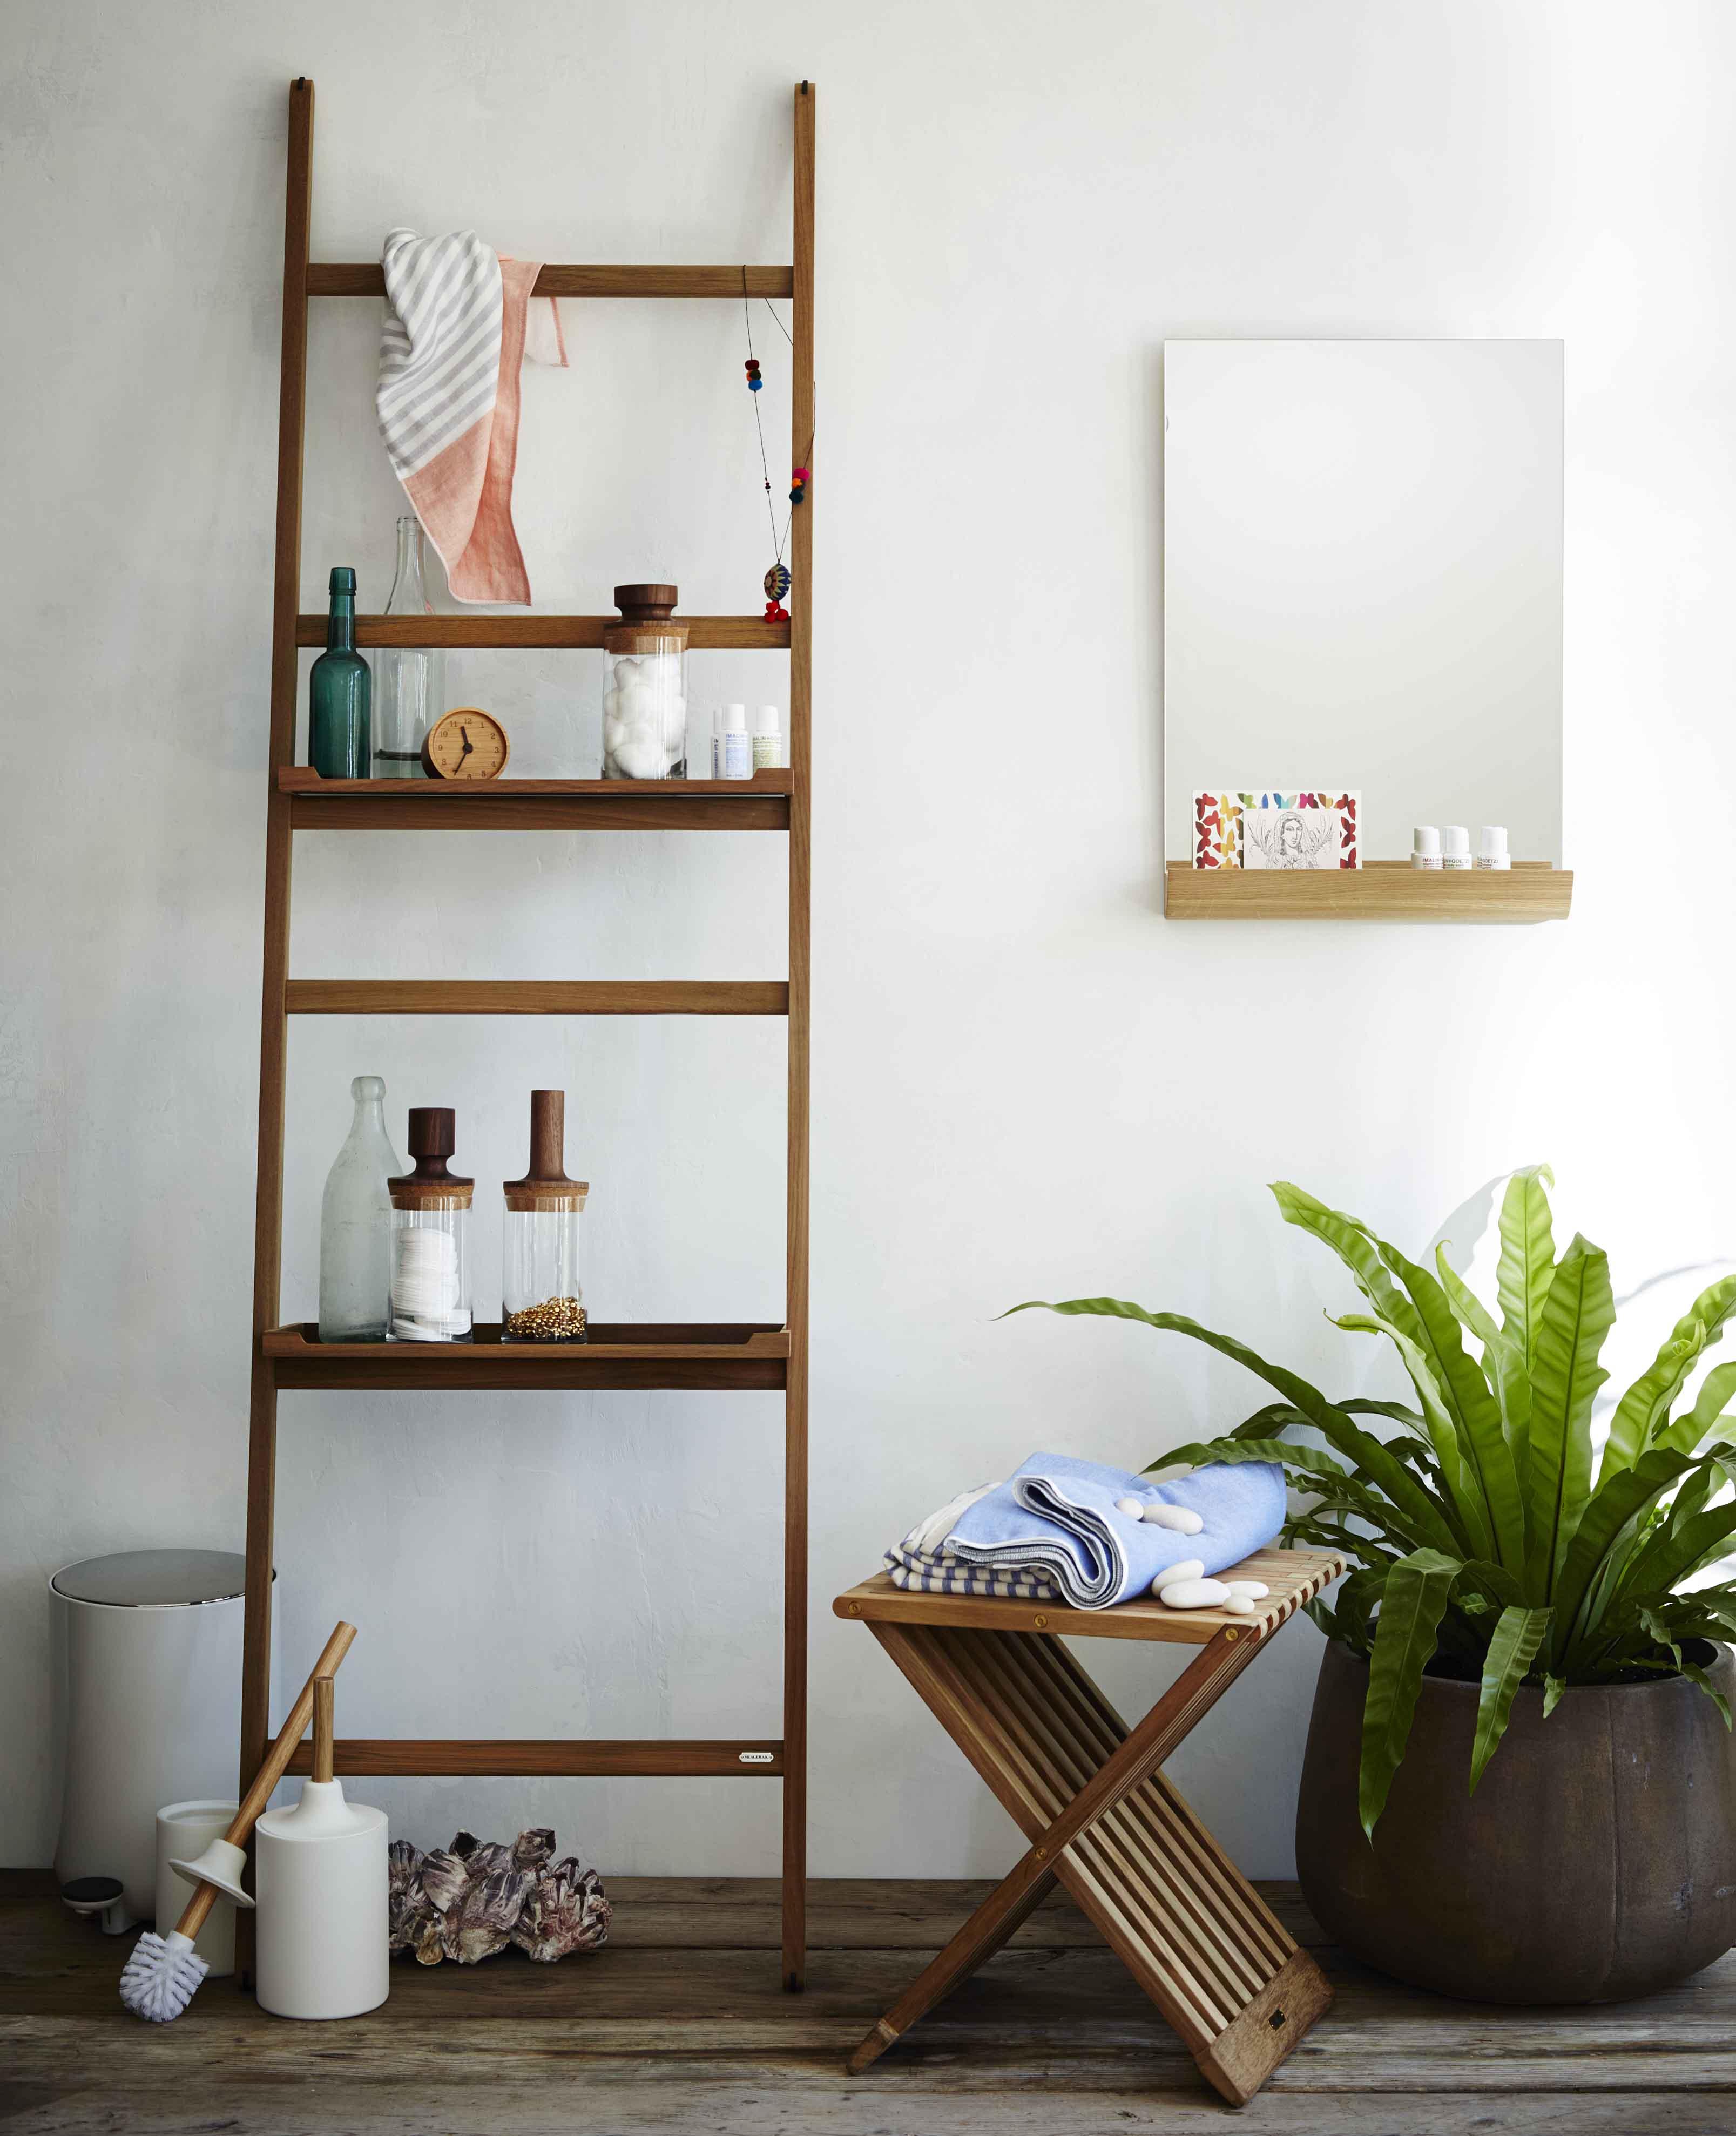 Elegant bathroom storage with ladder-like silhouette